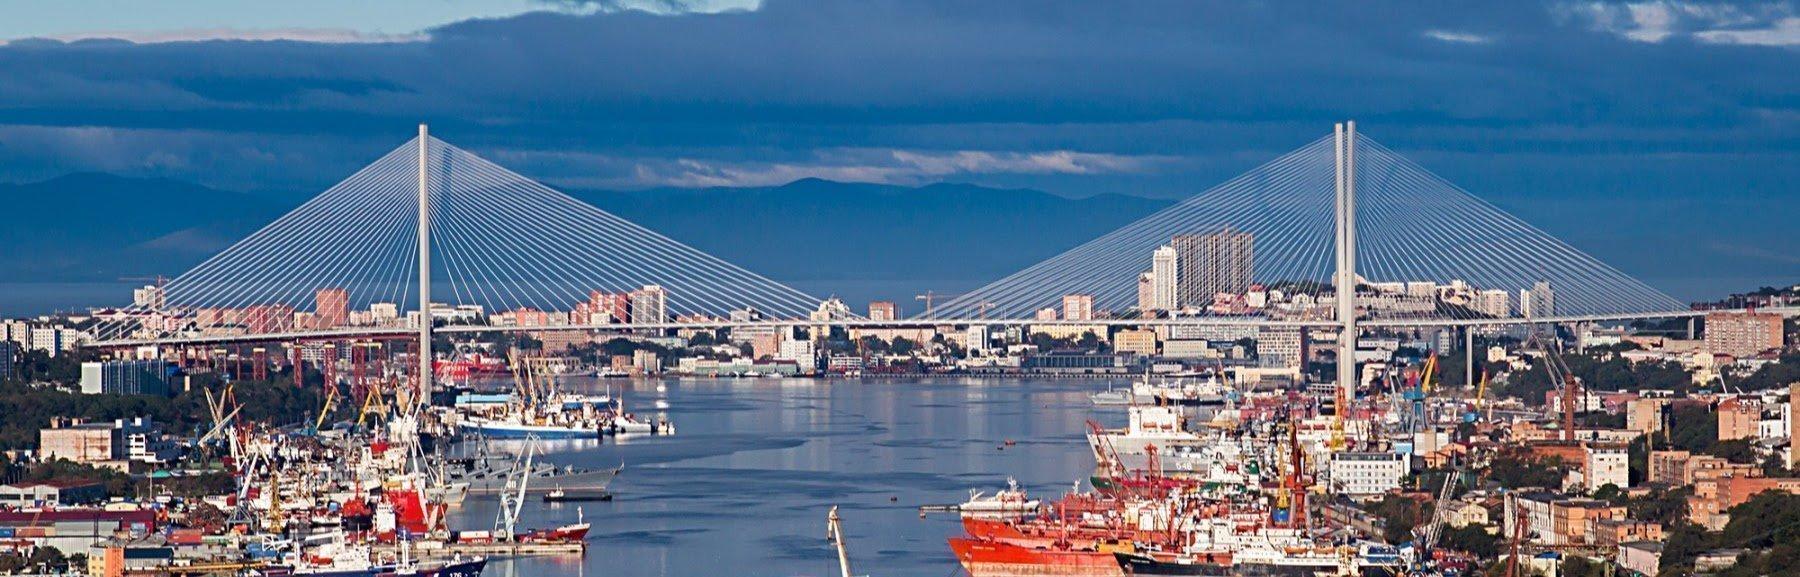 Sailing cruise in VLADIVOSTOK in AUGUST 2022